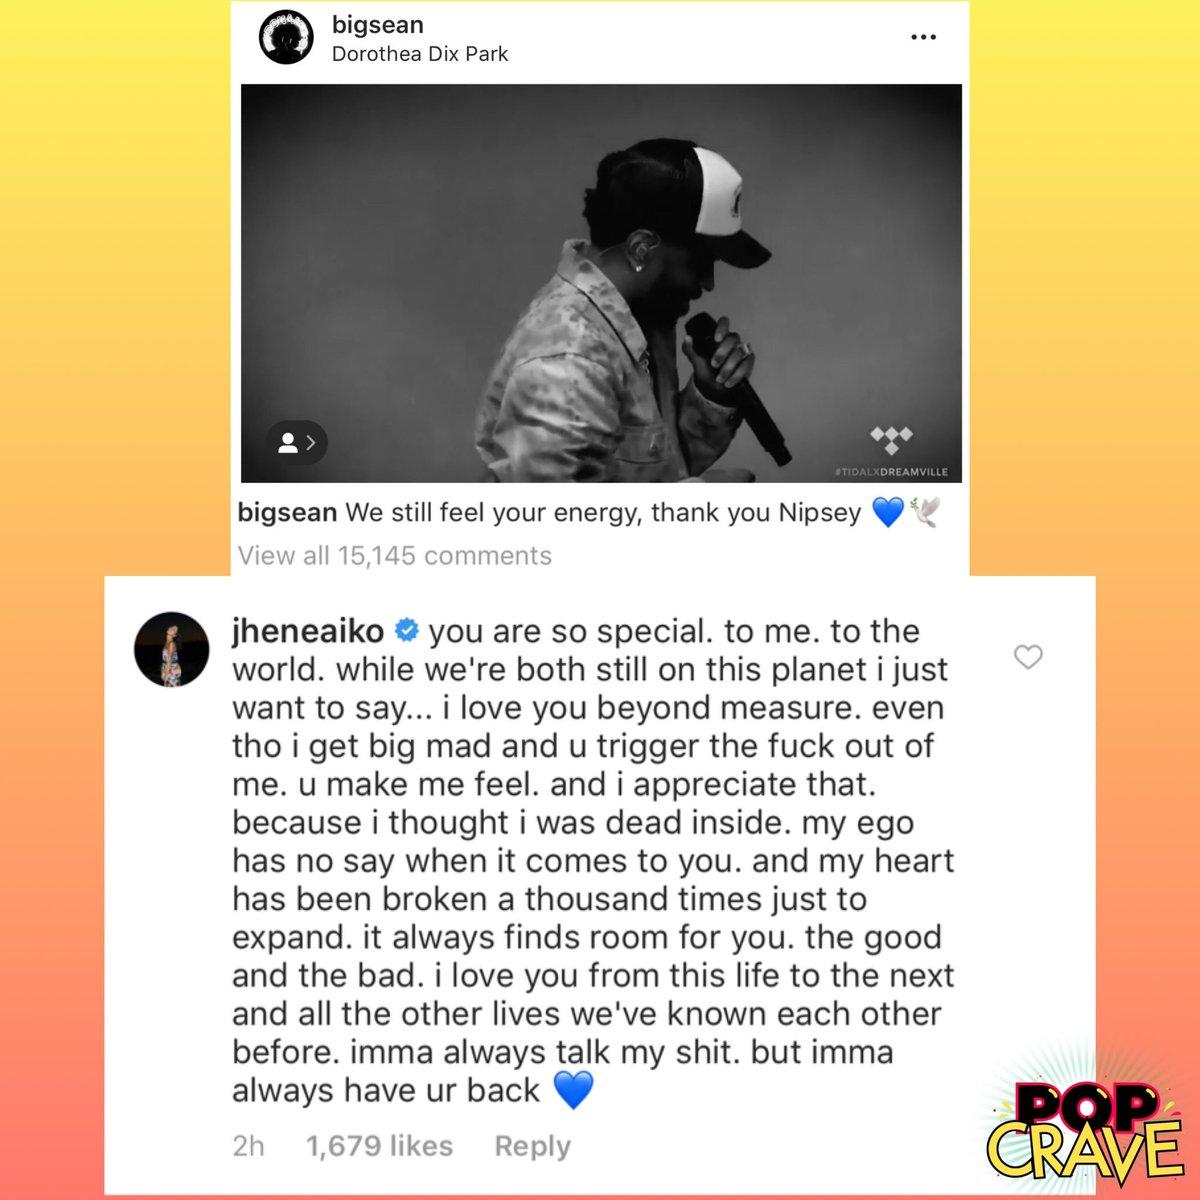 Top Five Jhene Aiko Big Sean Moments Lyrics - Circus